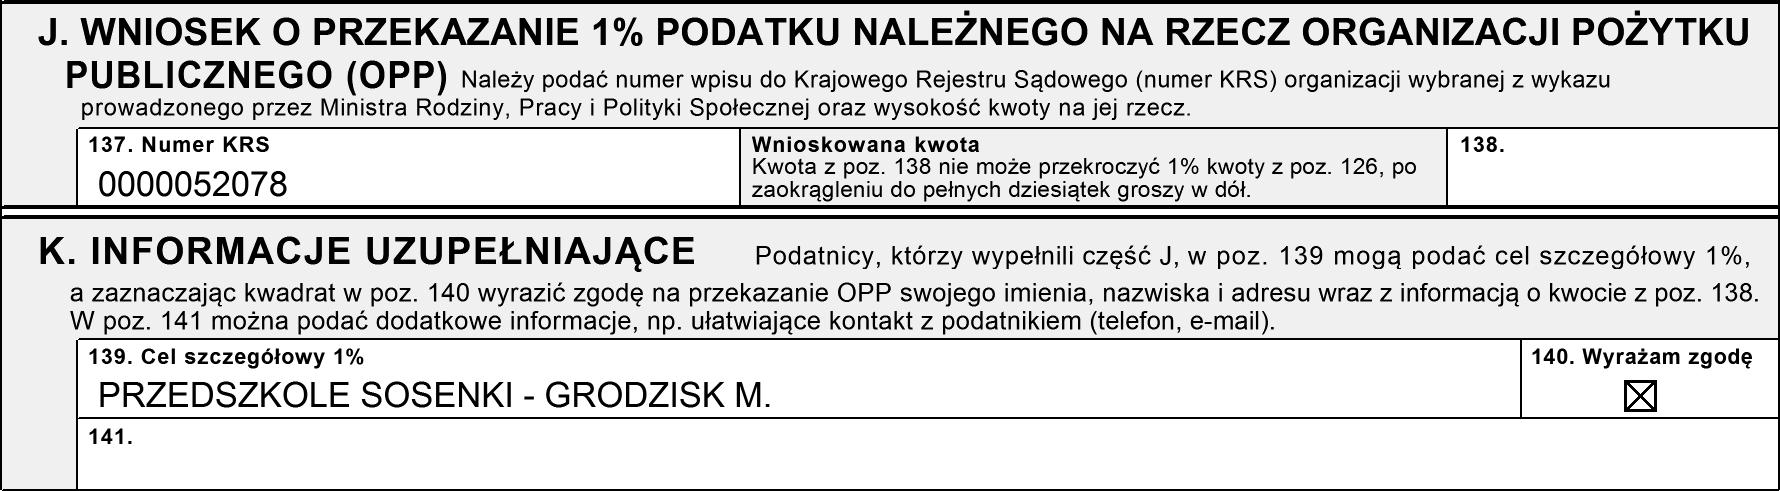 KRS Sosenki Pit 37